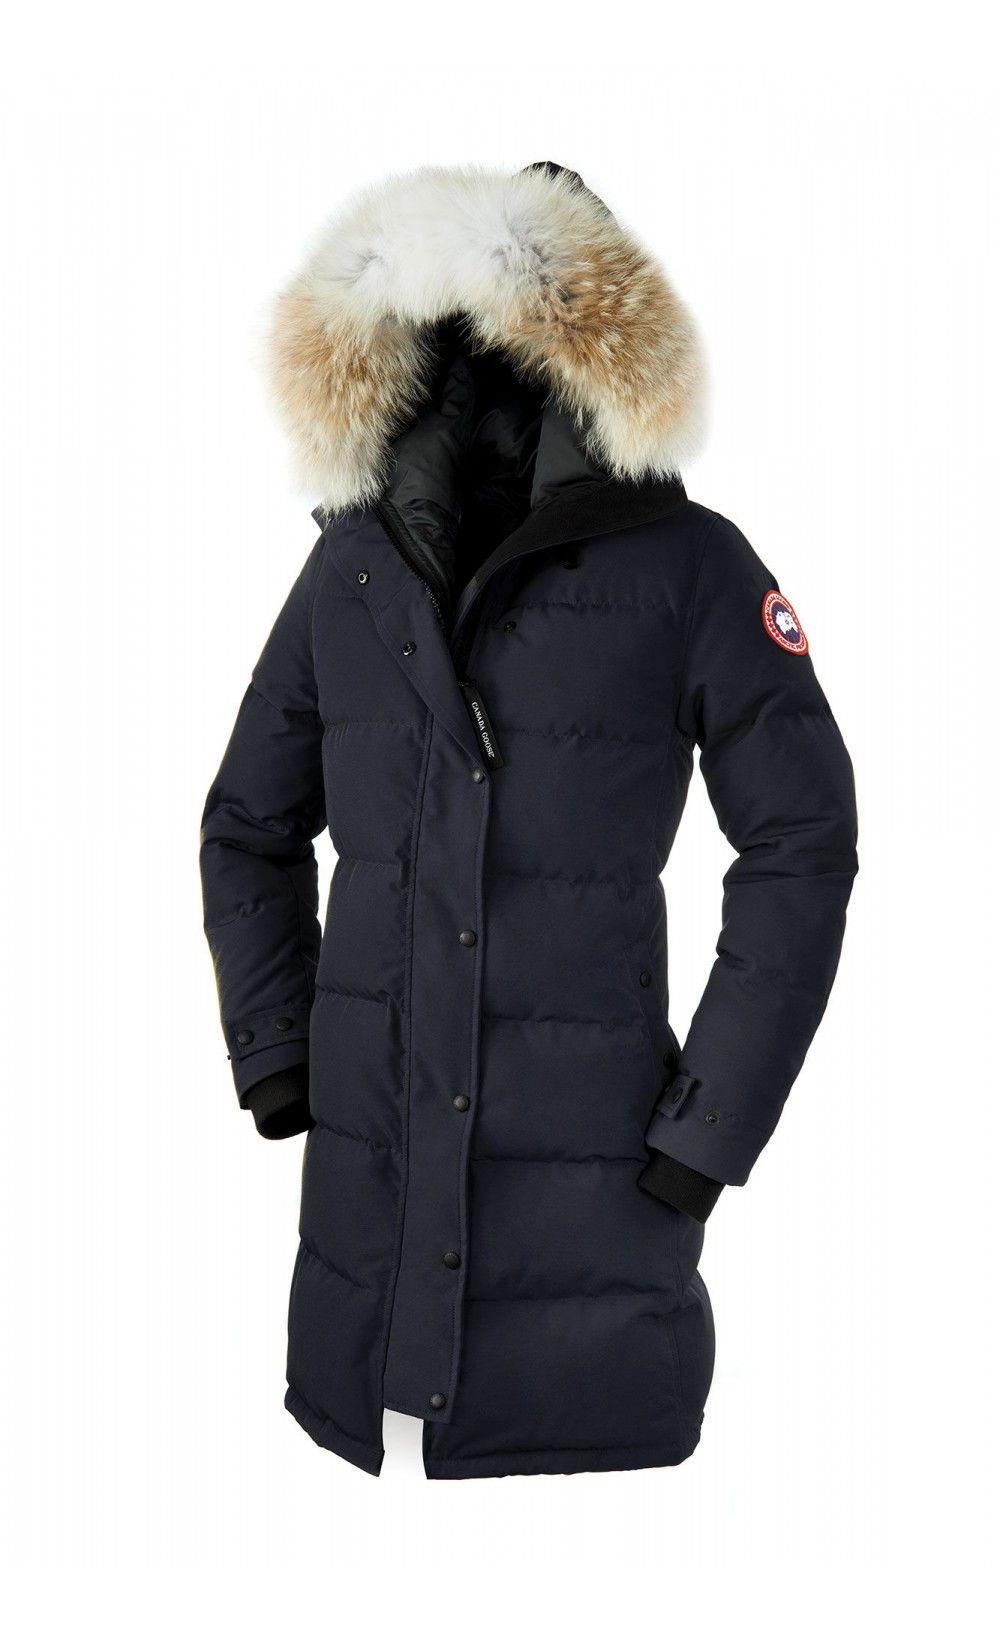 Canada Goose Shelburne Parka Navy Women - Canada Goose  canadagoose  women   parka  jacket  winter  newyear  gifts  fashion  lifestyle 135b4ae18f